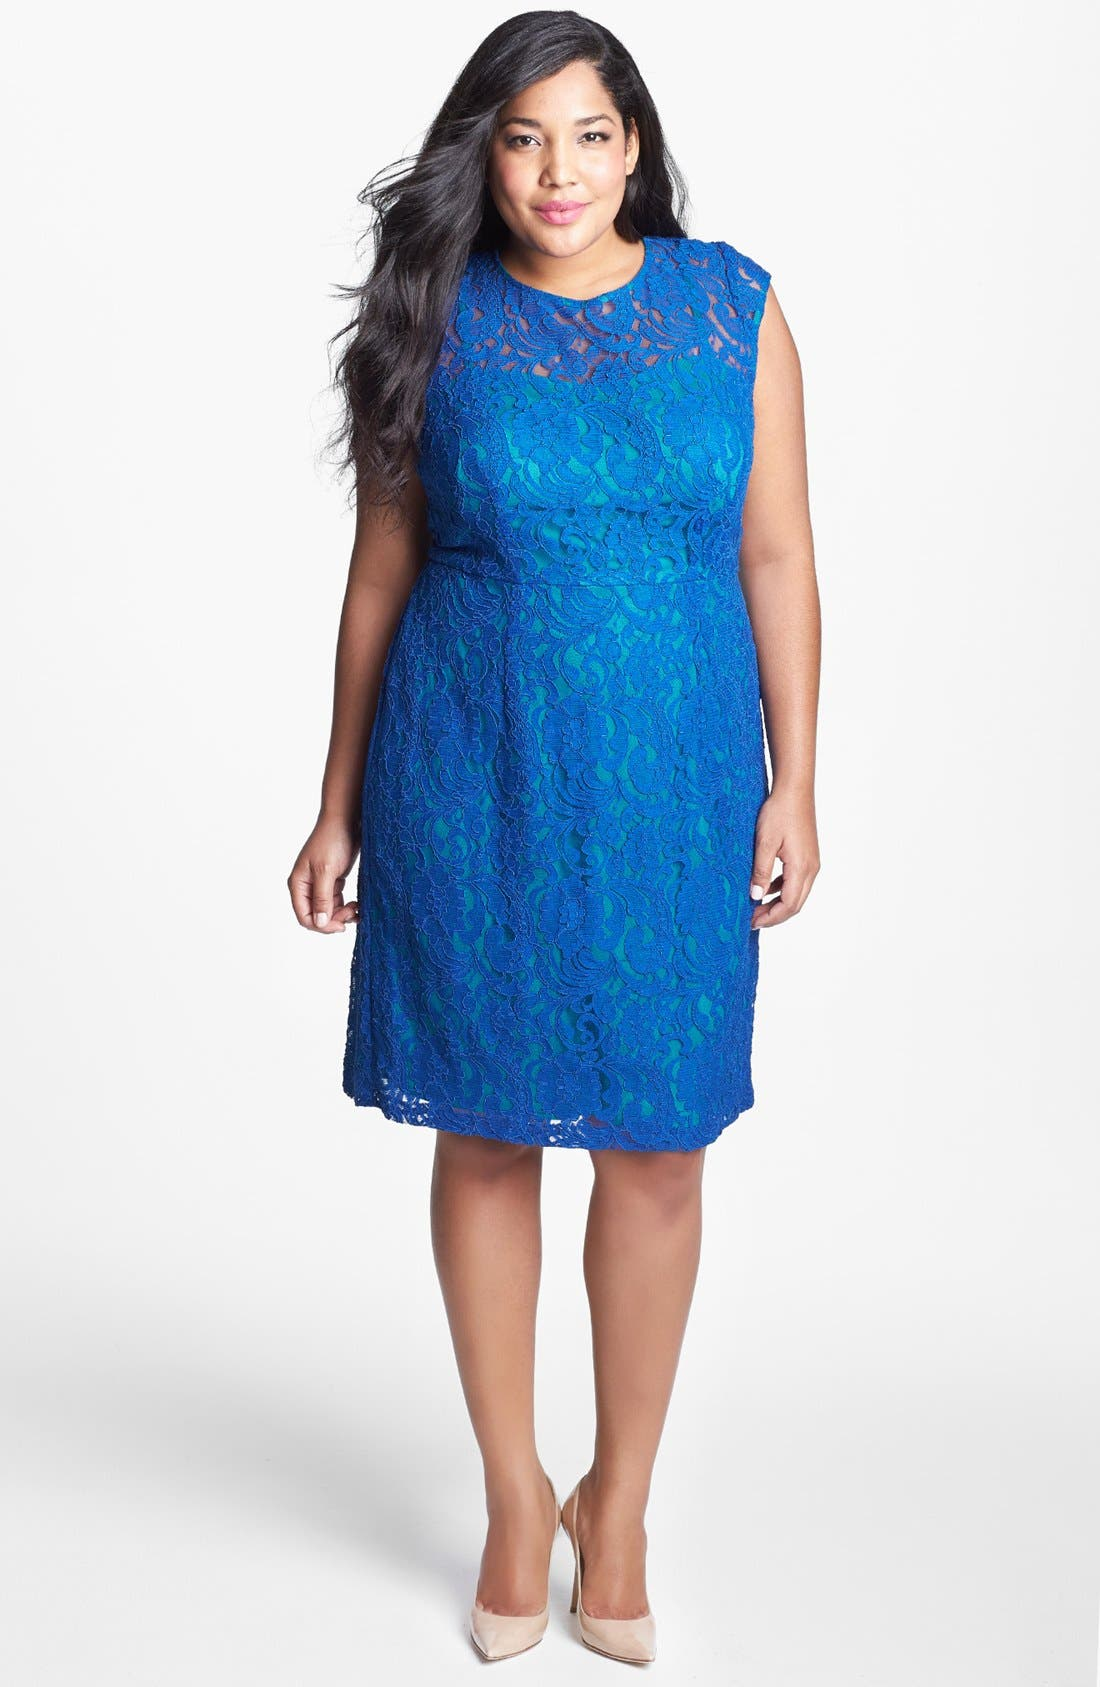 Main Image - Ivy & Blu Lace Fit & Flare Dress (Plus Size)